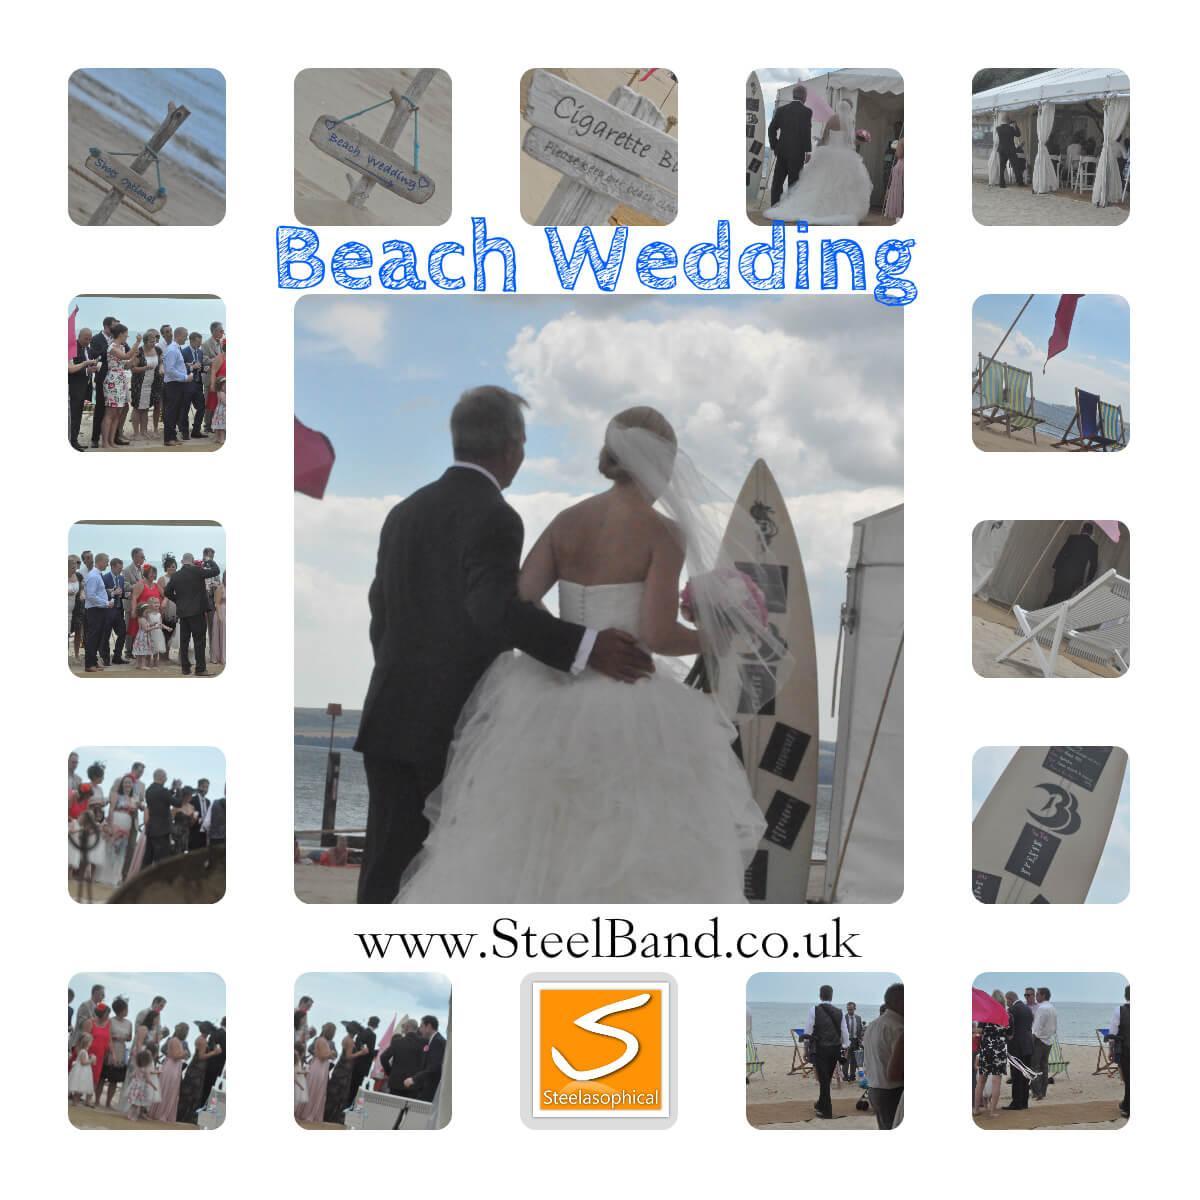 Beach Weddings Bournemouth Steeasophical